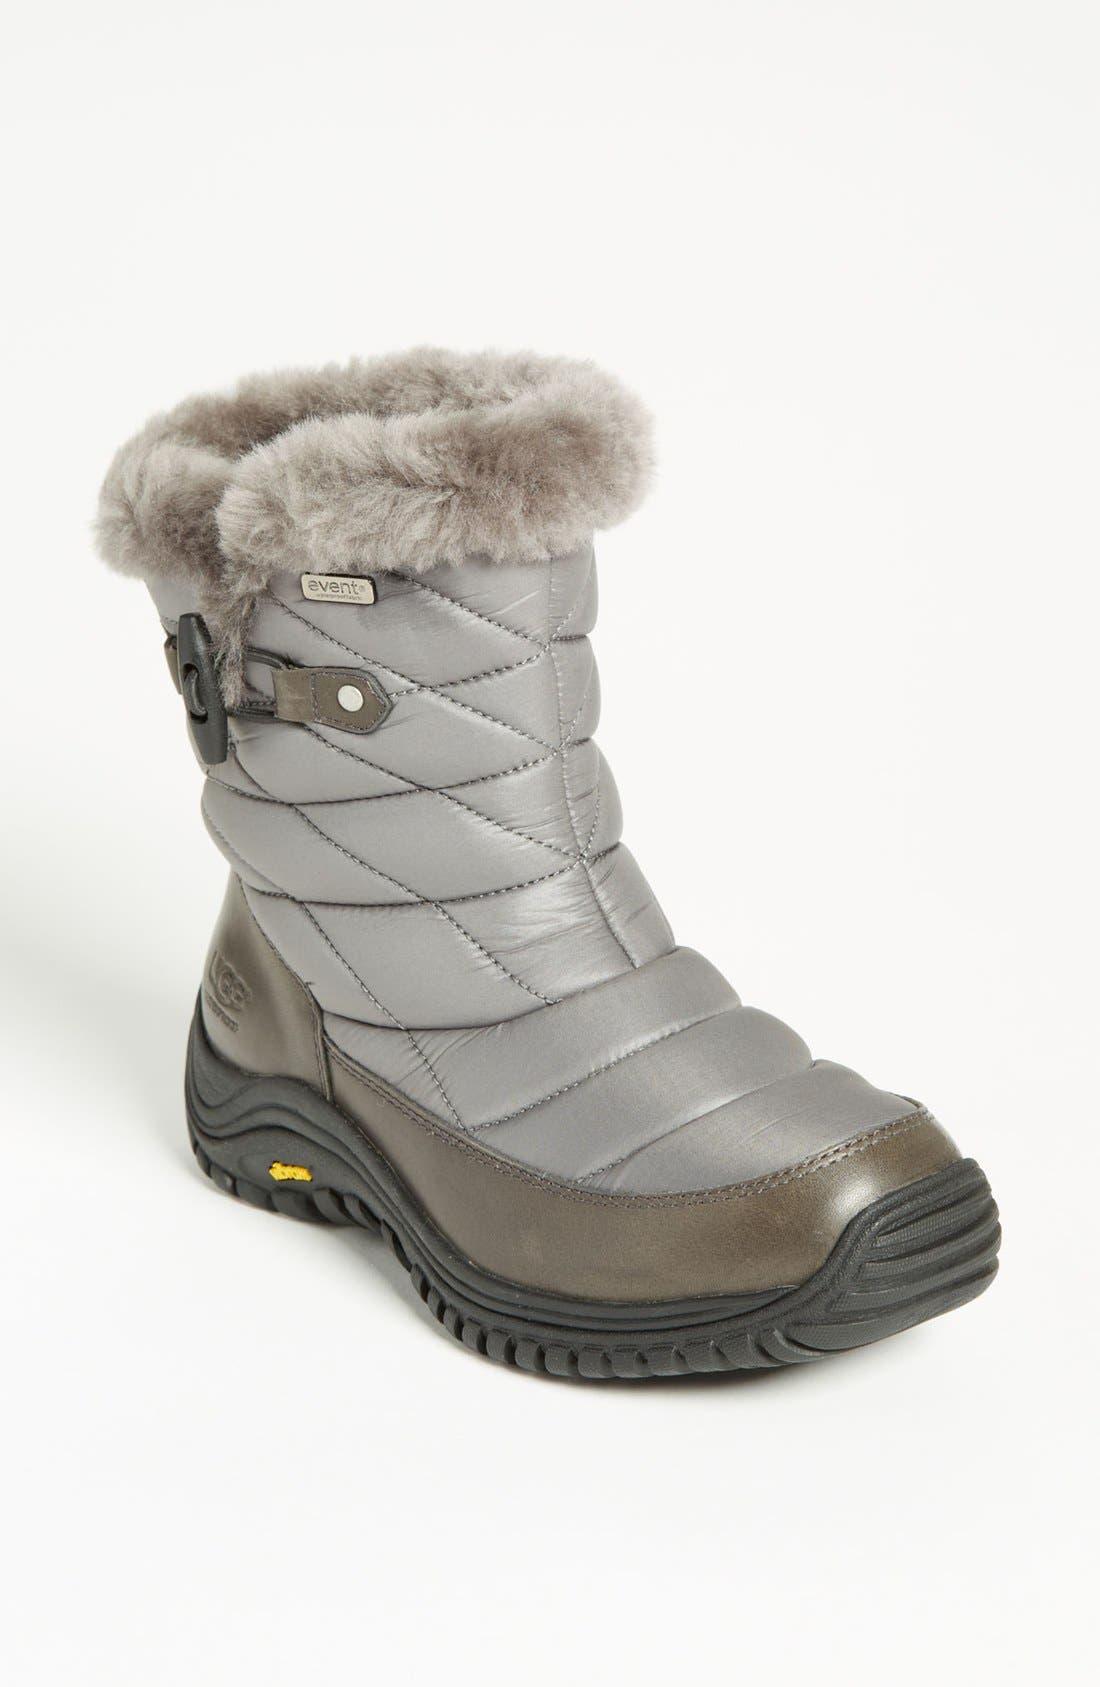 Alternate Image 1 Selected - UGG® 'Ambra' Waterproof Boot (Women)